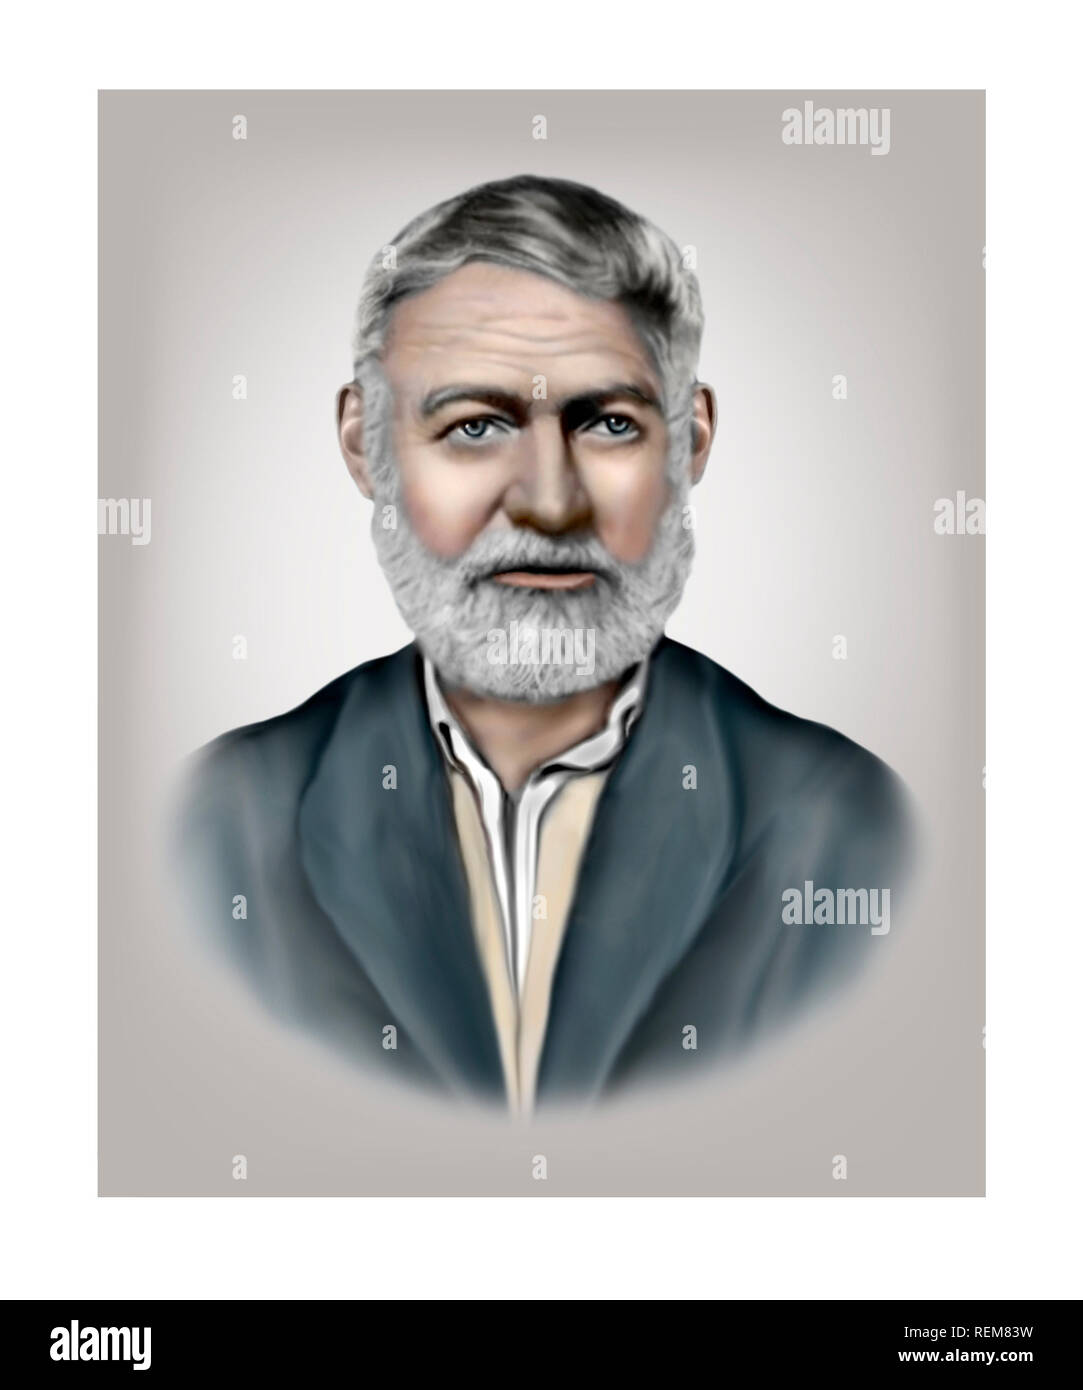 Ernest Hemingway 1899-1961 American Novelist Short Story Writer Journalist - Stock Image